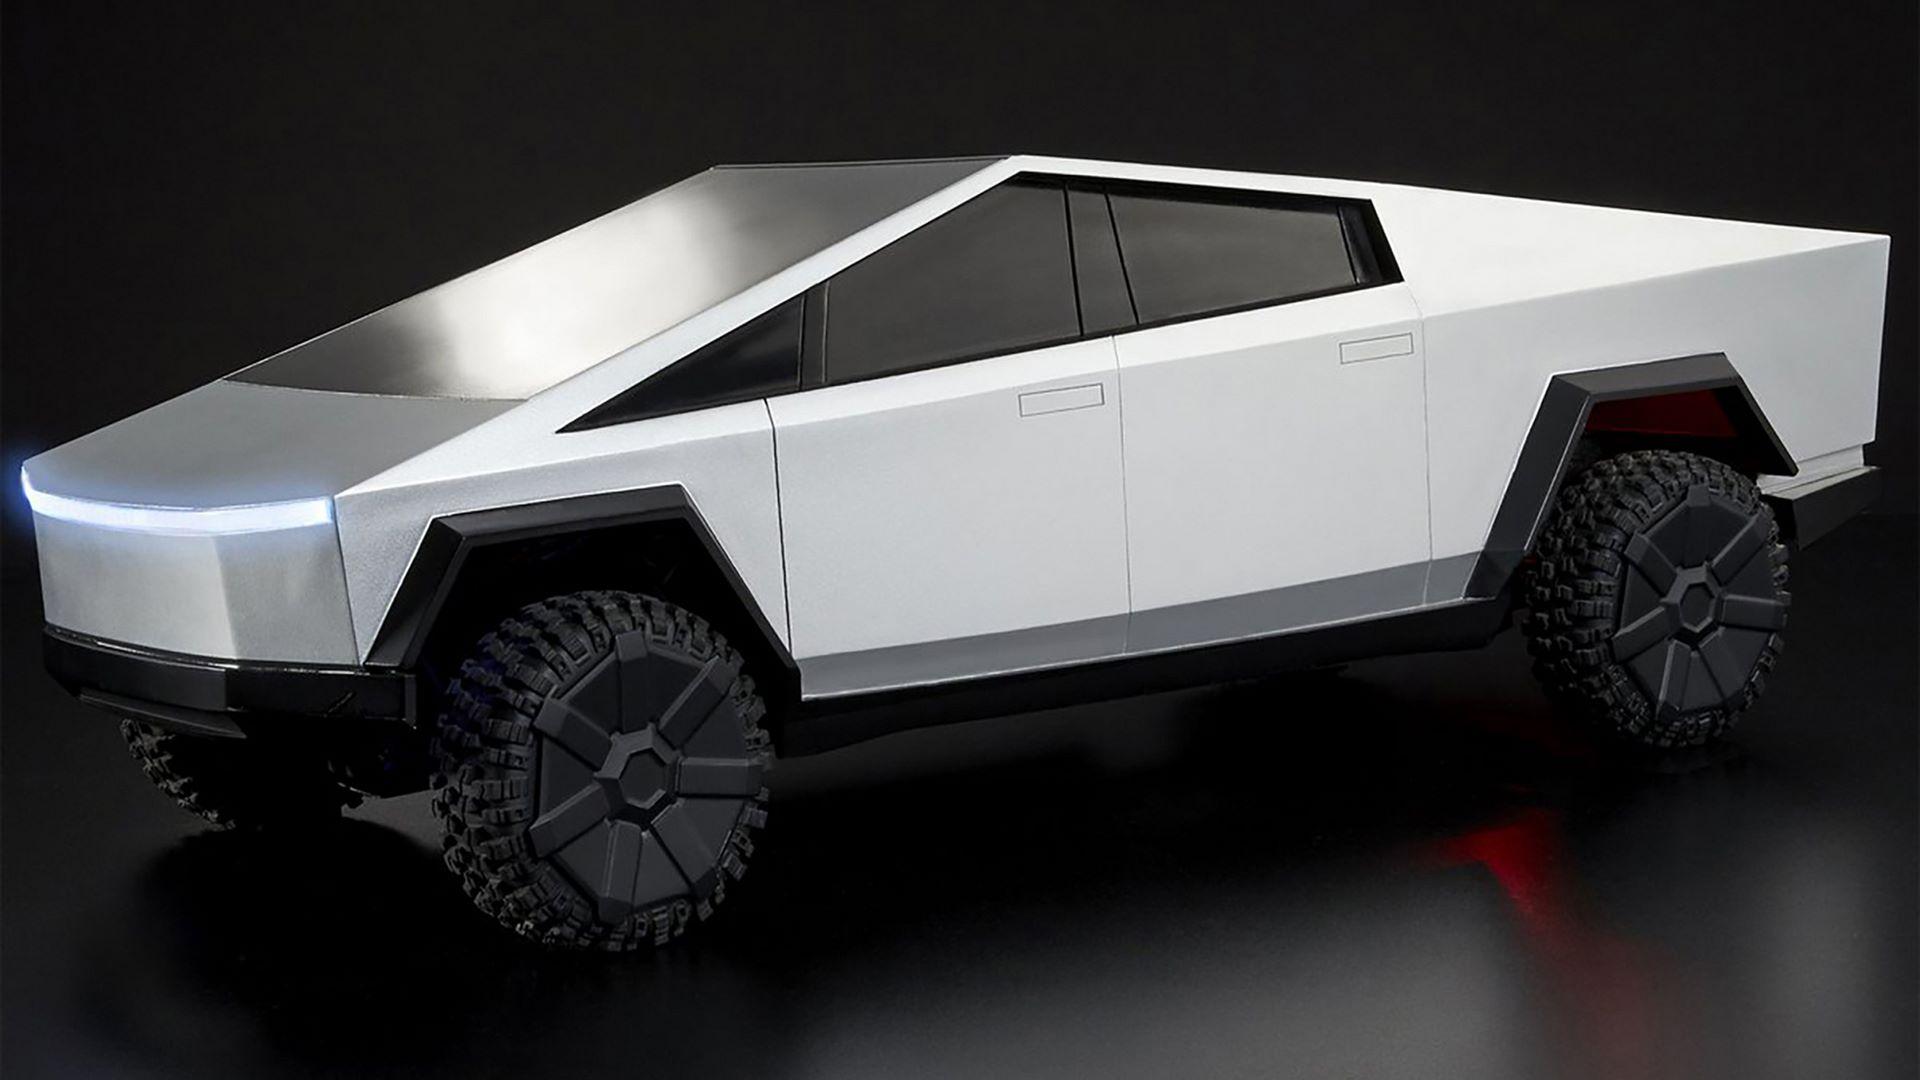 Hot-Wheels-RC-Tesla-Cybertruck-13